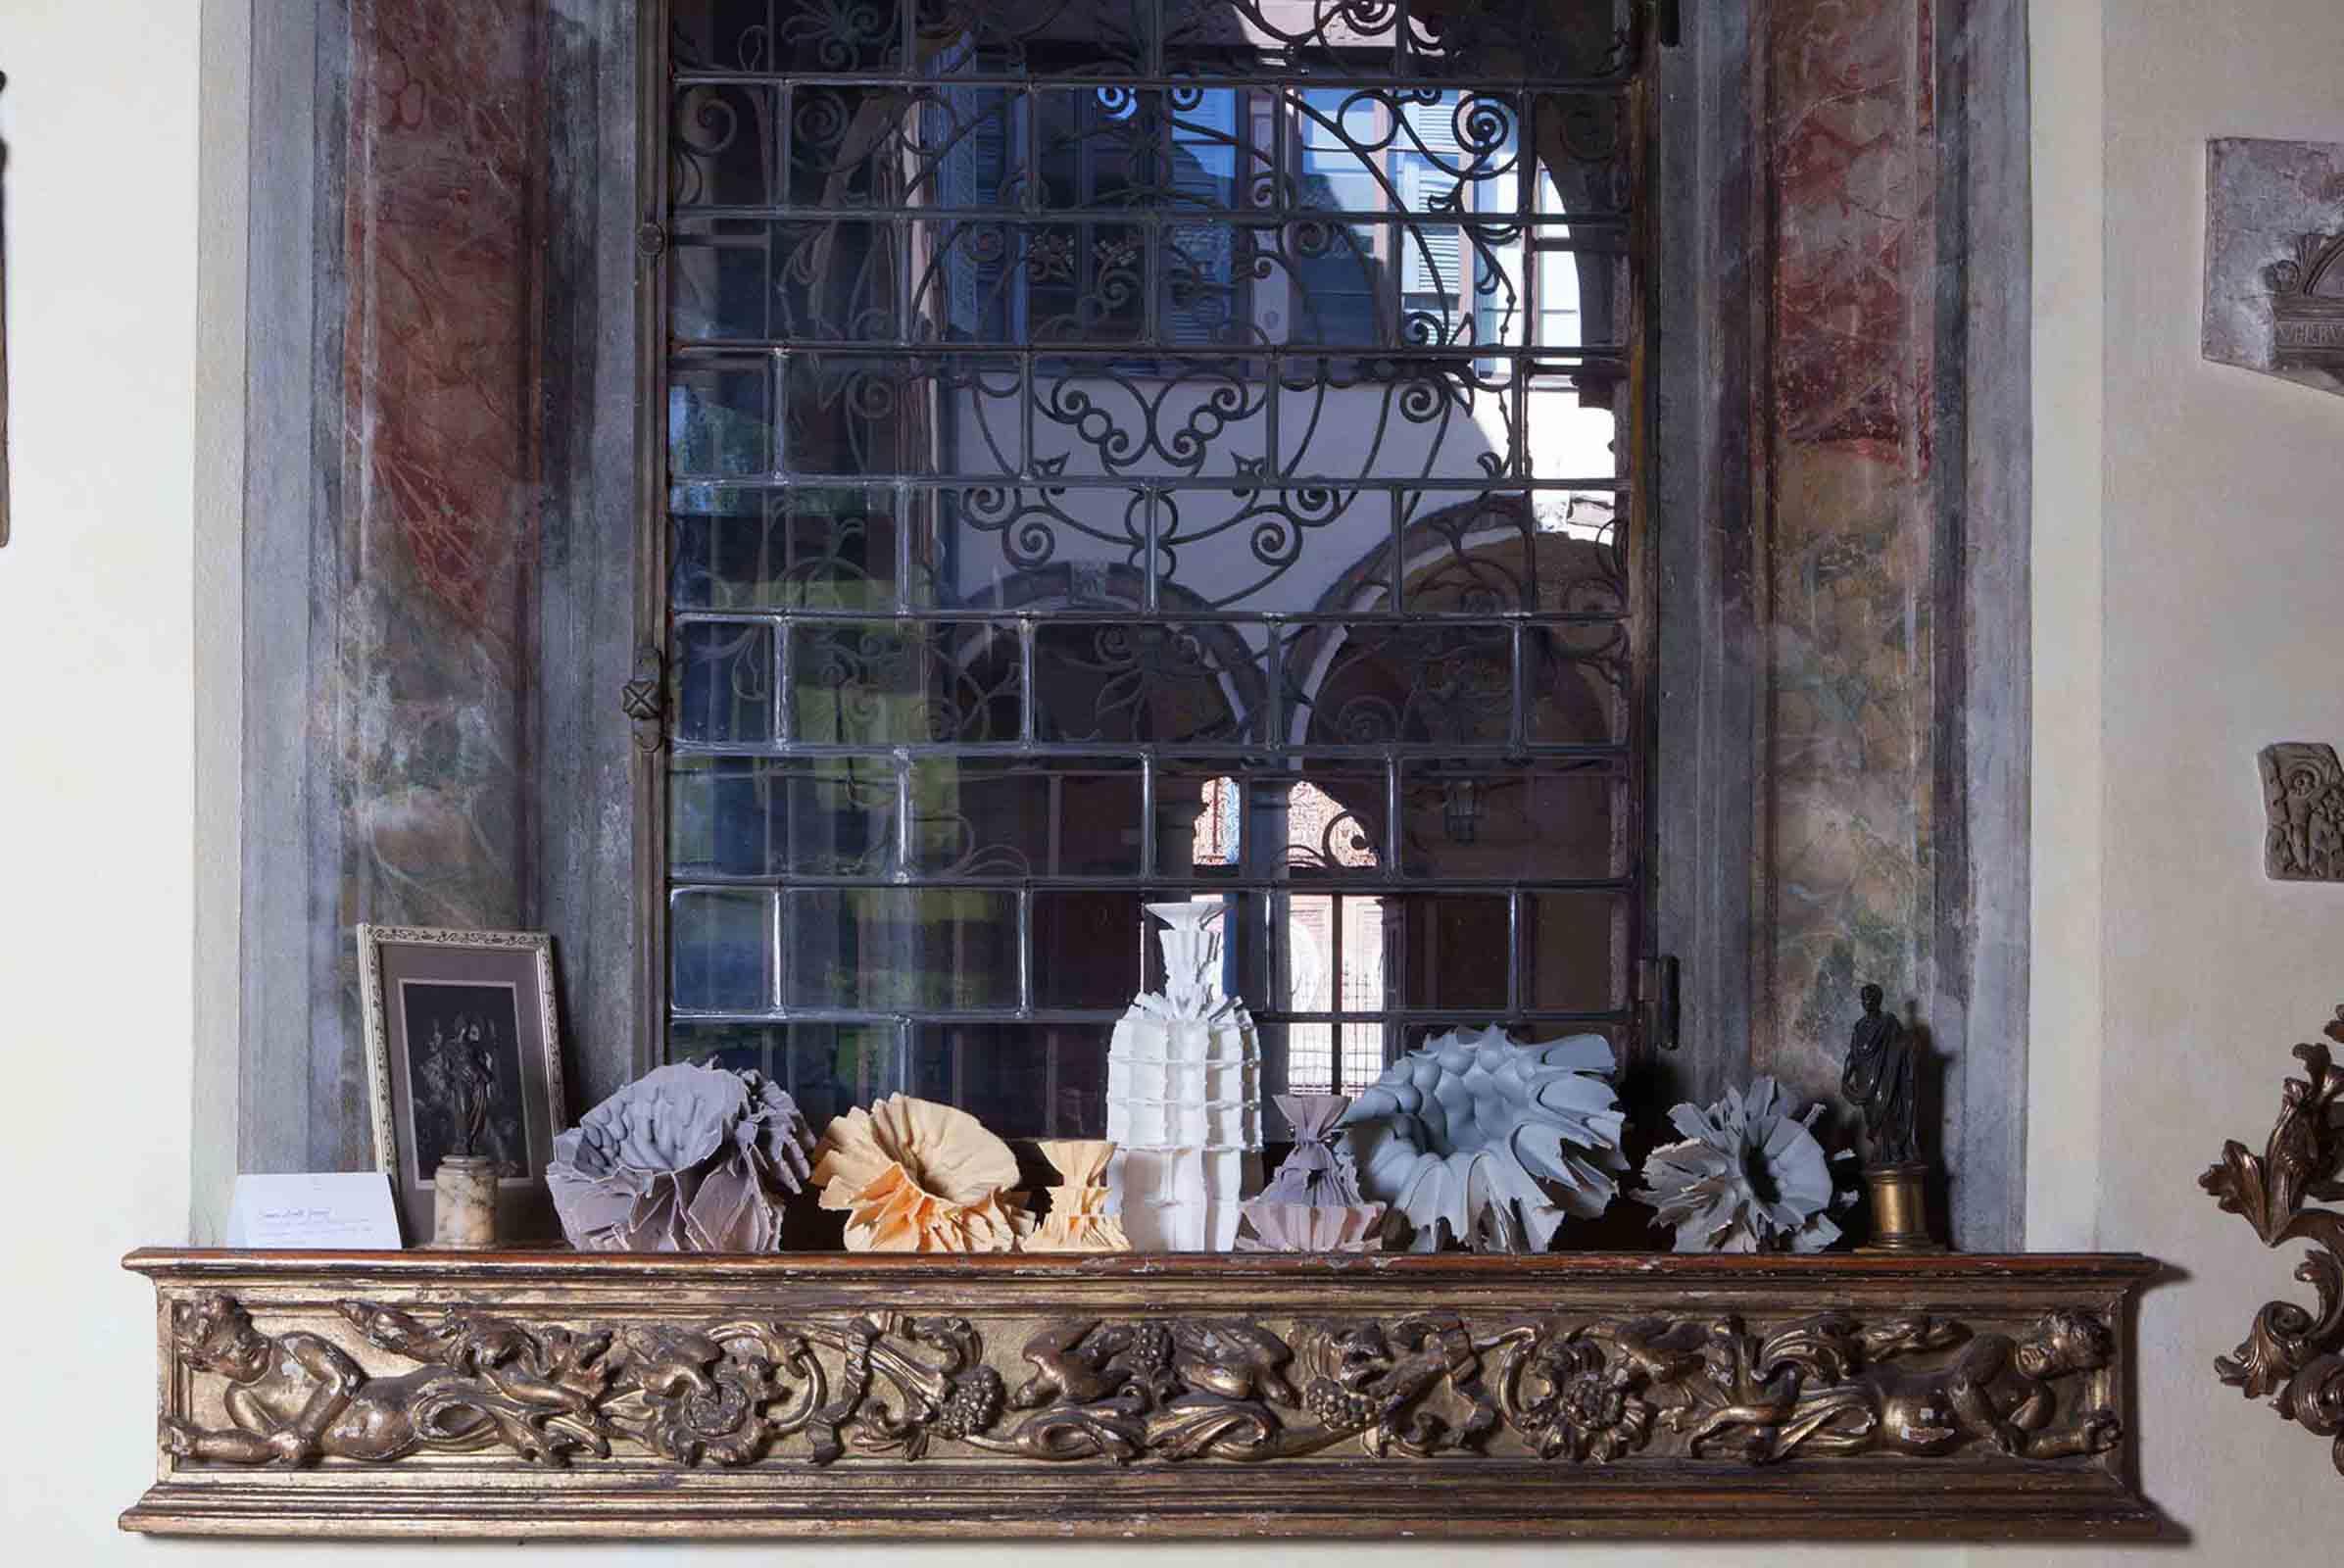 Simon-Zsolt-Josef-at-Passeggiata,-An-Airbnb-Experience-of-Milan.jpg